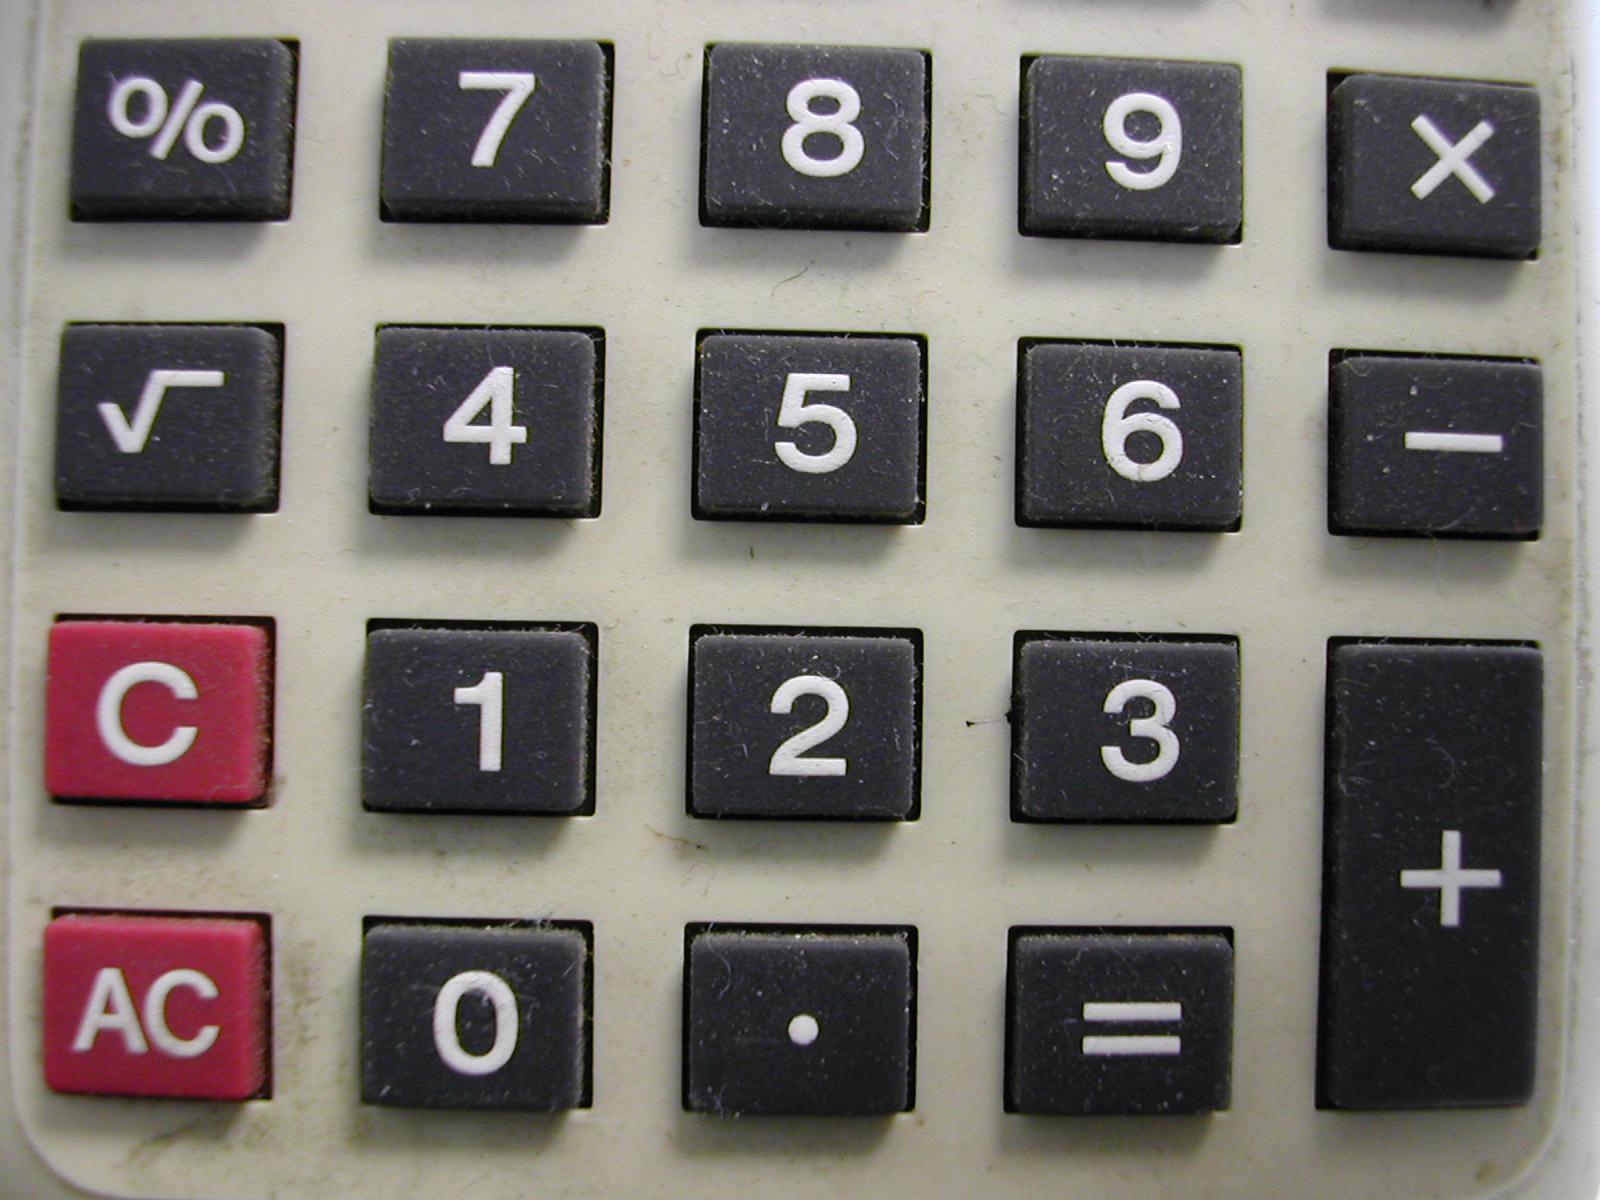 Imageafter Photos Mcmath Dial Phone Calculator Buttons Number